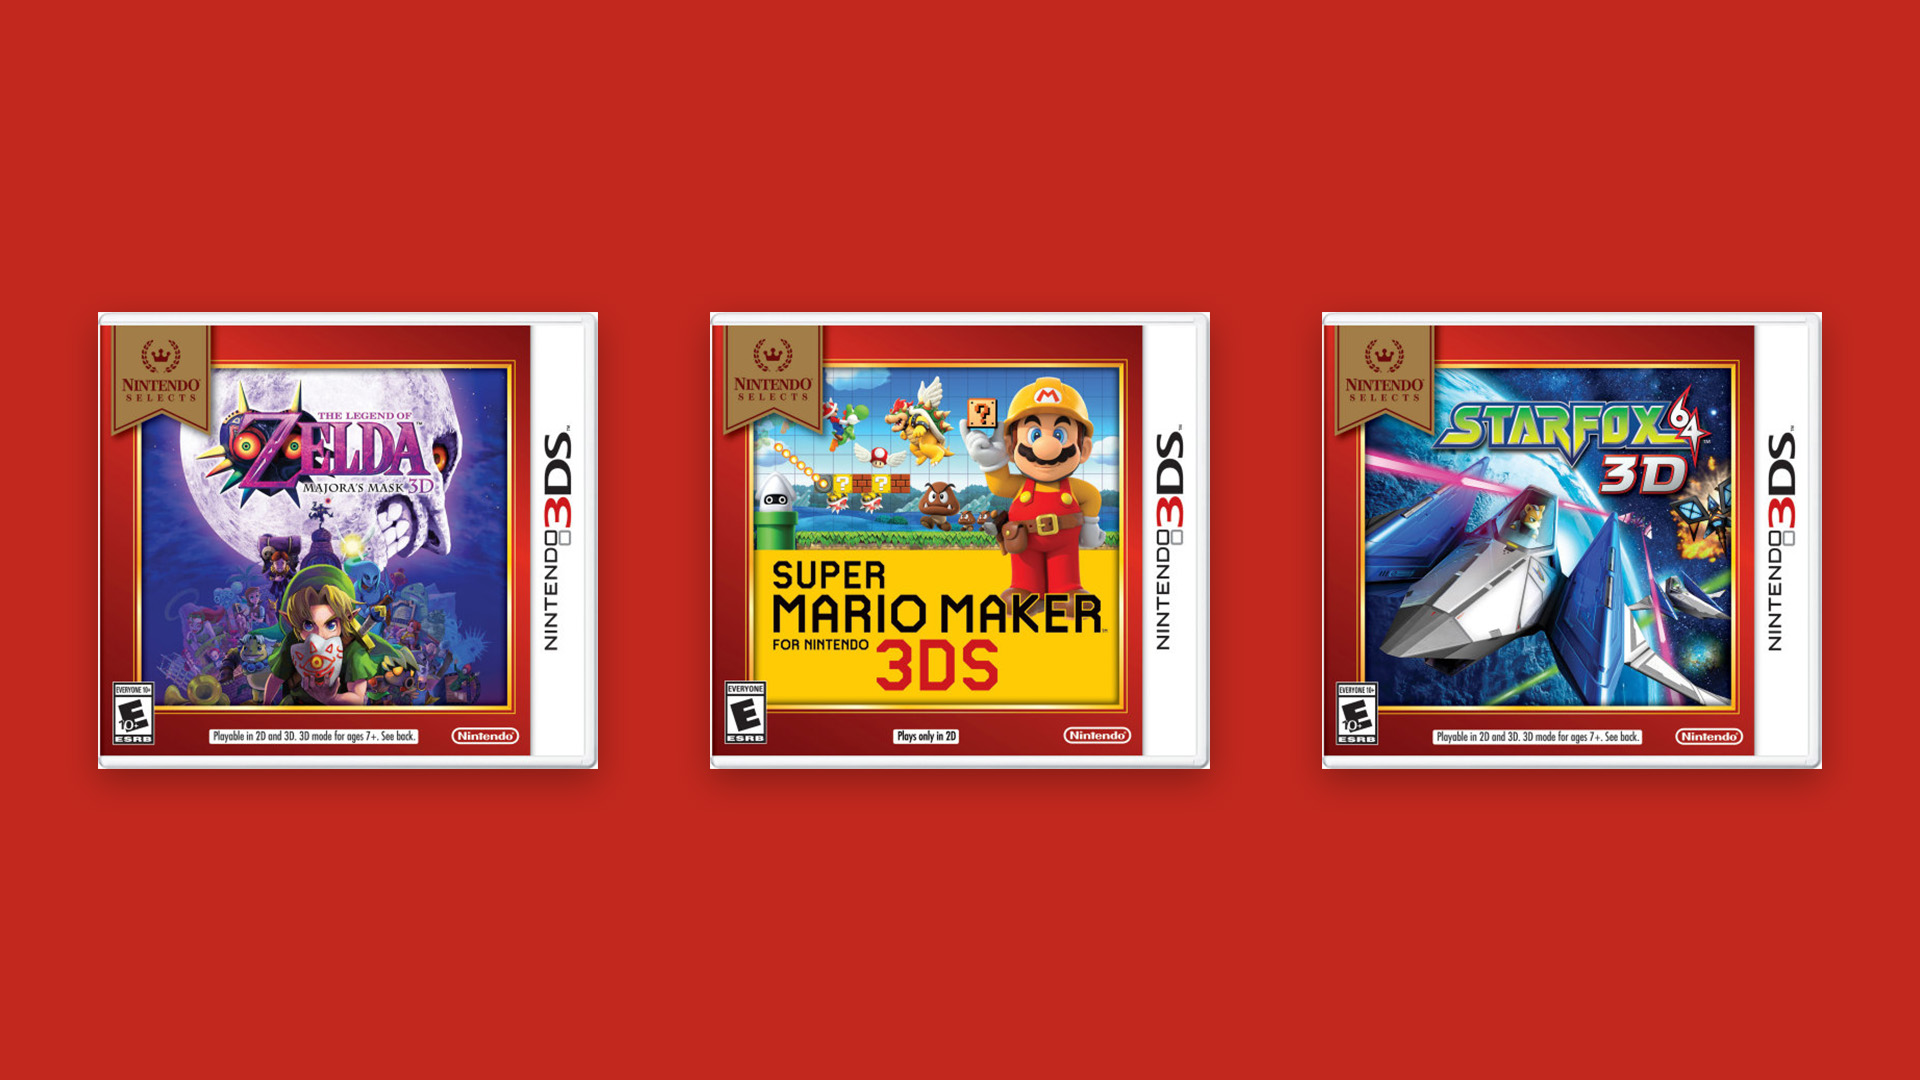 Nintendo Selects 4 febbraio 2019